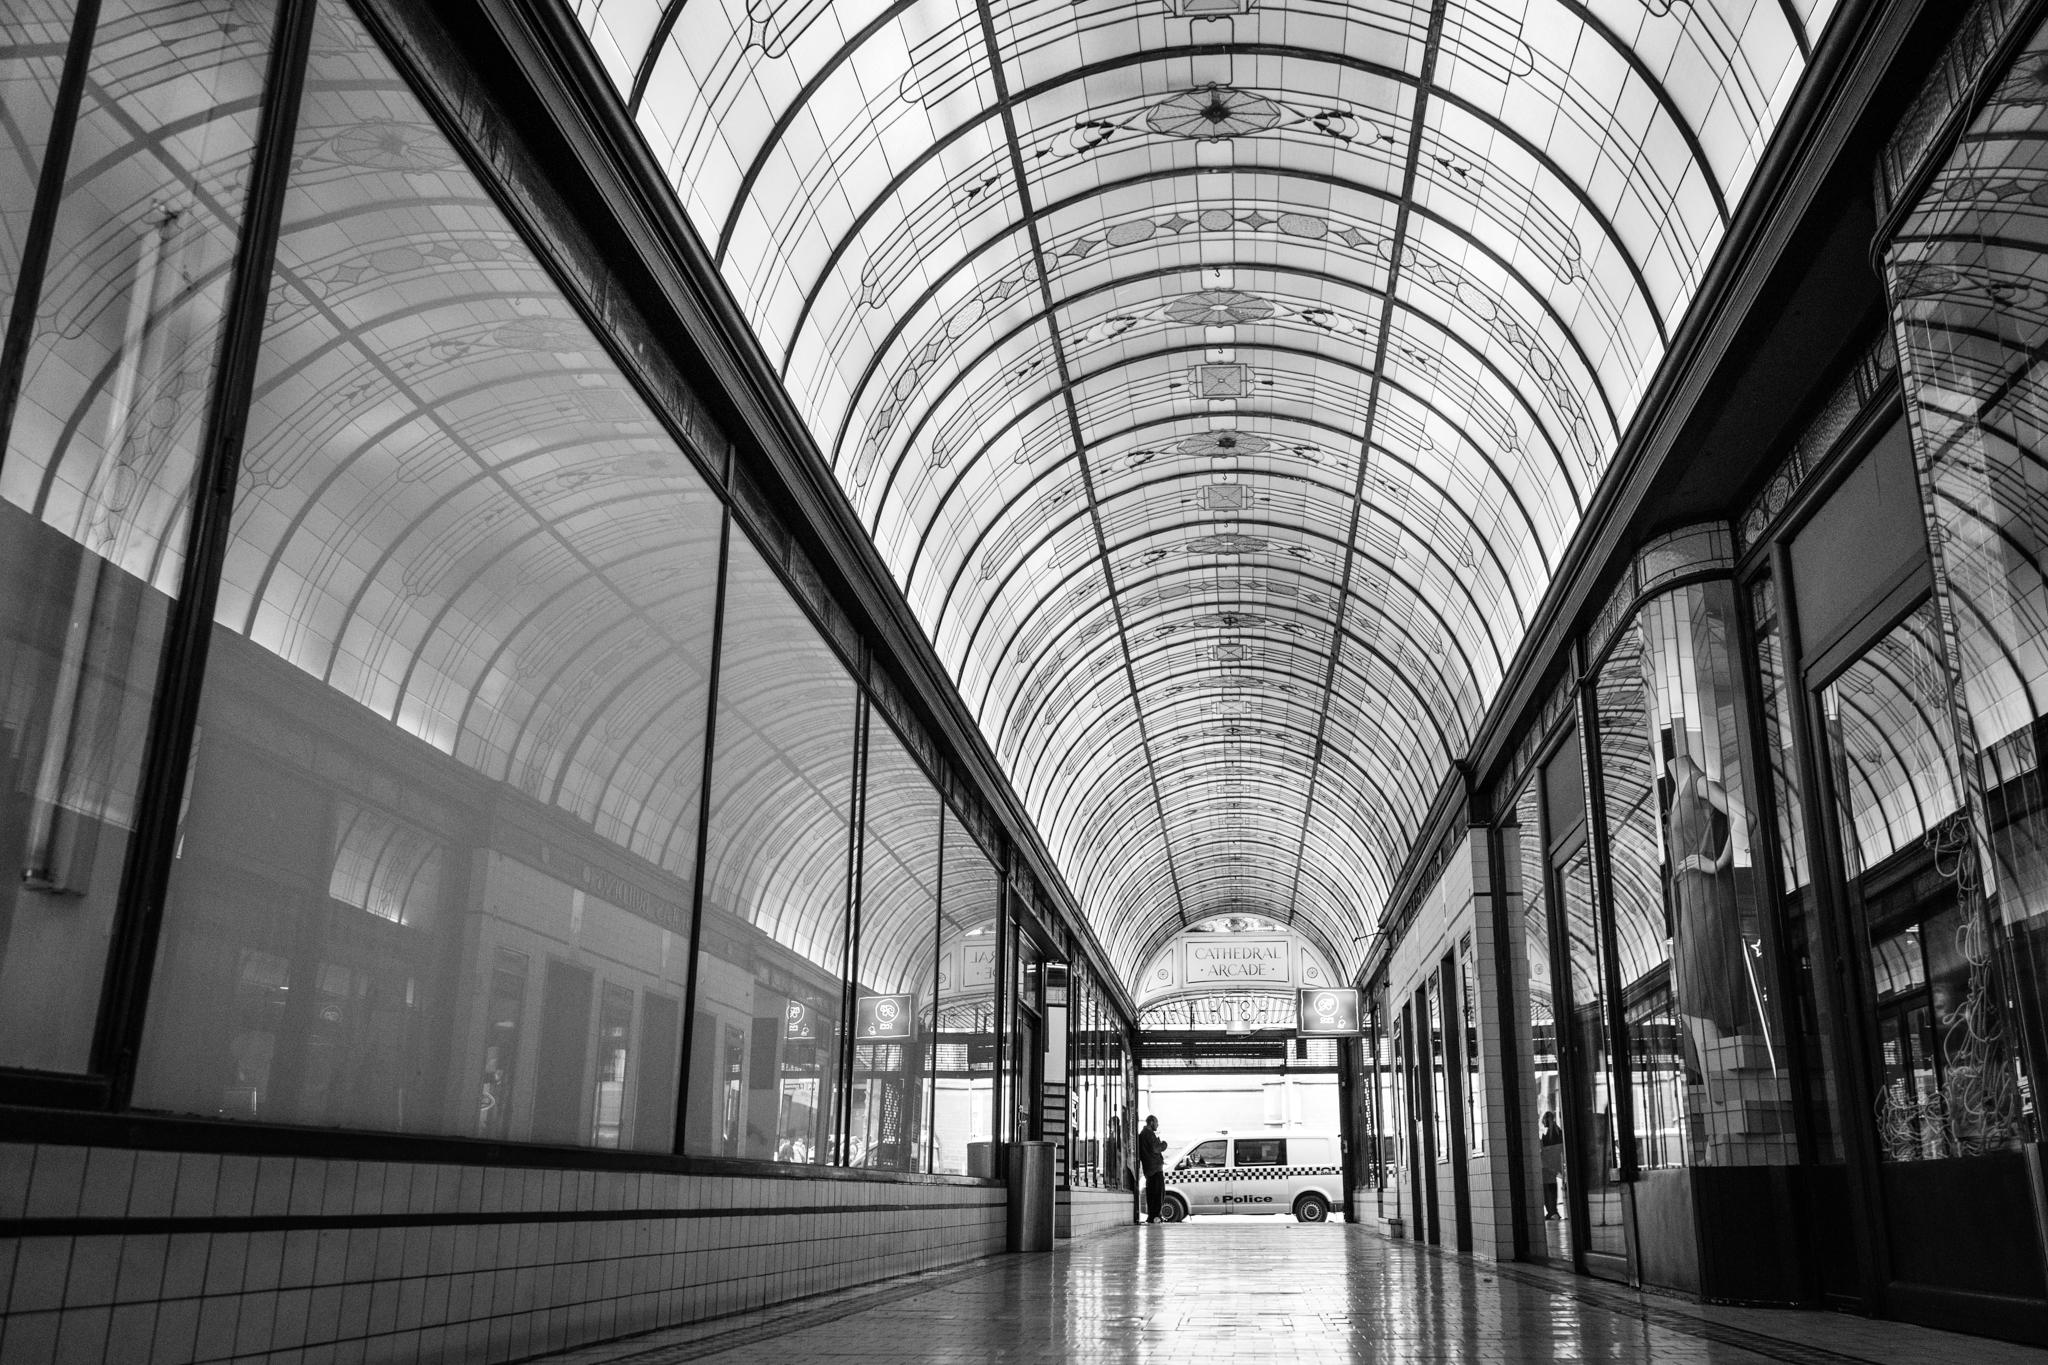 arcade-roof-long.jpg